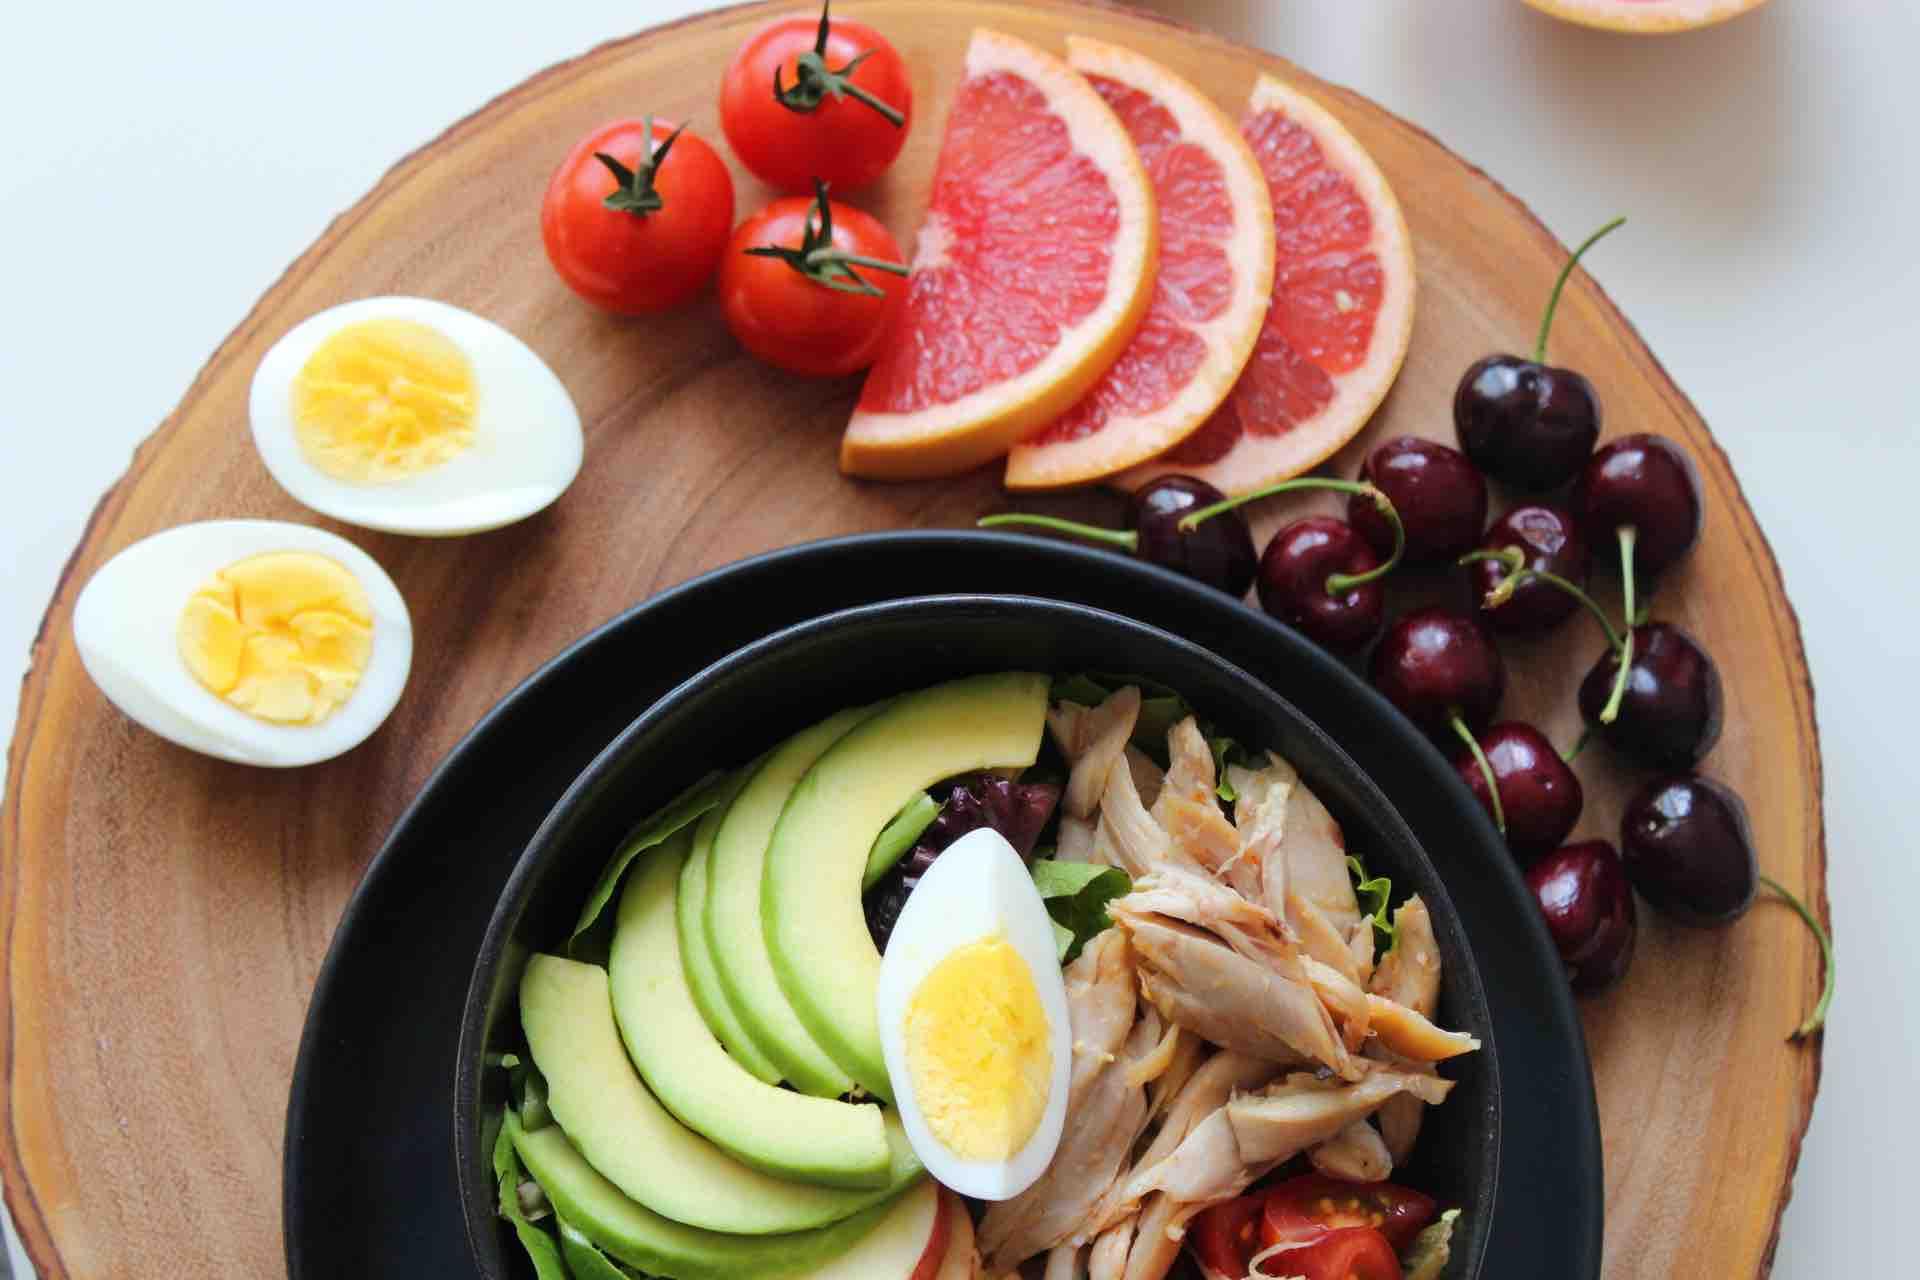 Voeding speelt centrale rol - Corinne Pool